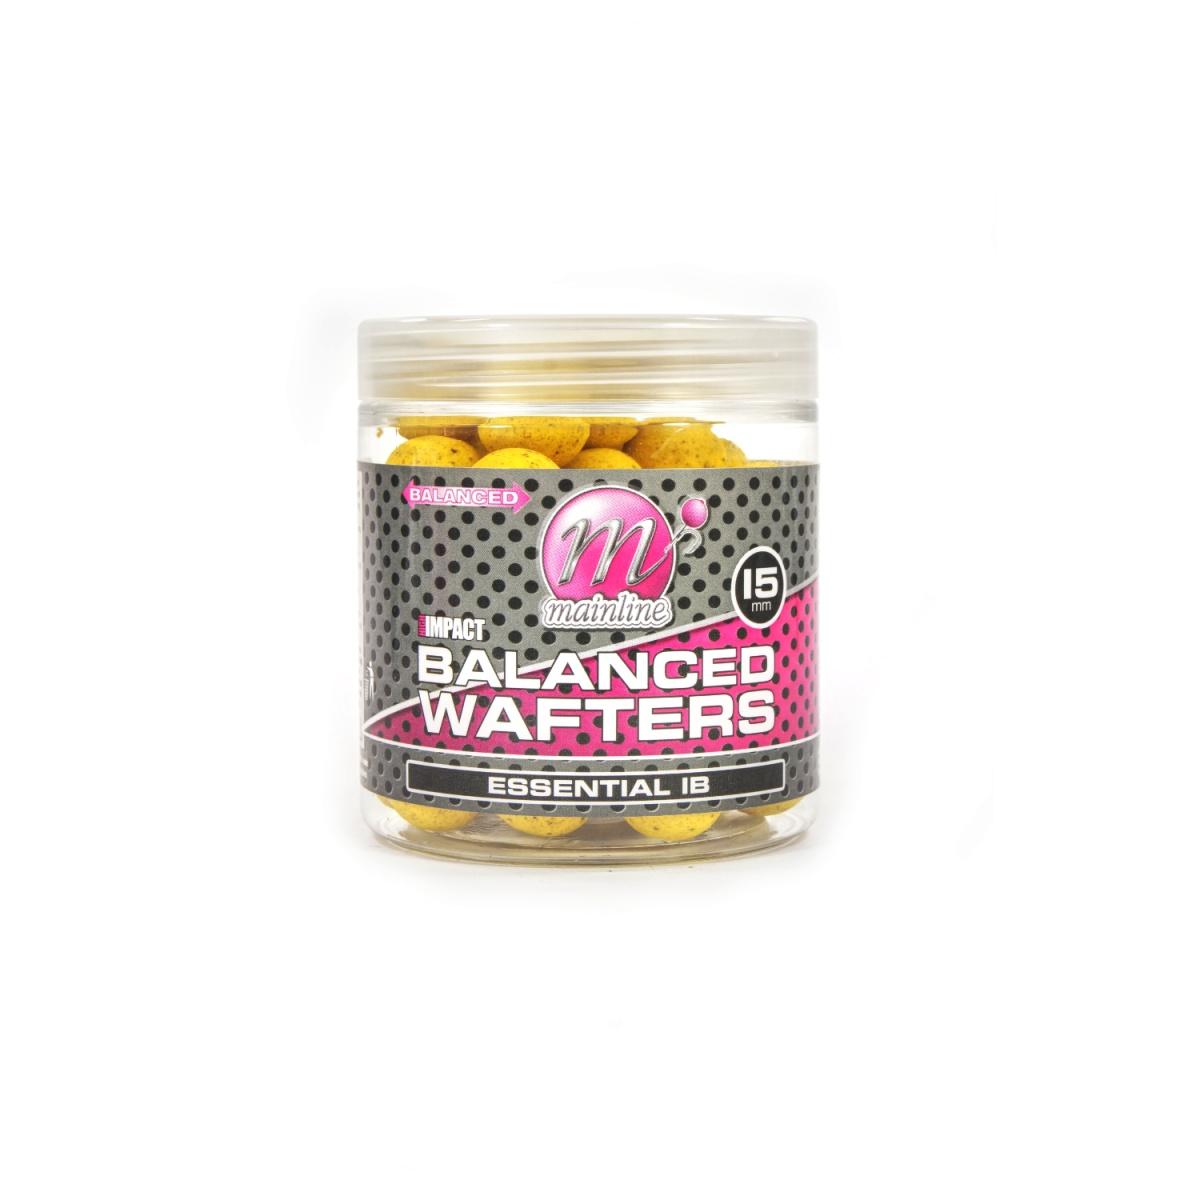 Mainline Balanced Wafters Essential IB rozmiar 15mm